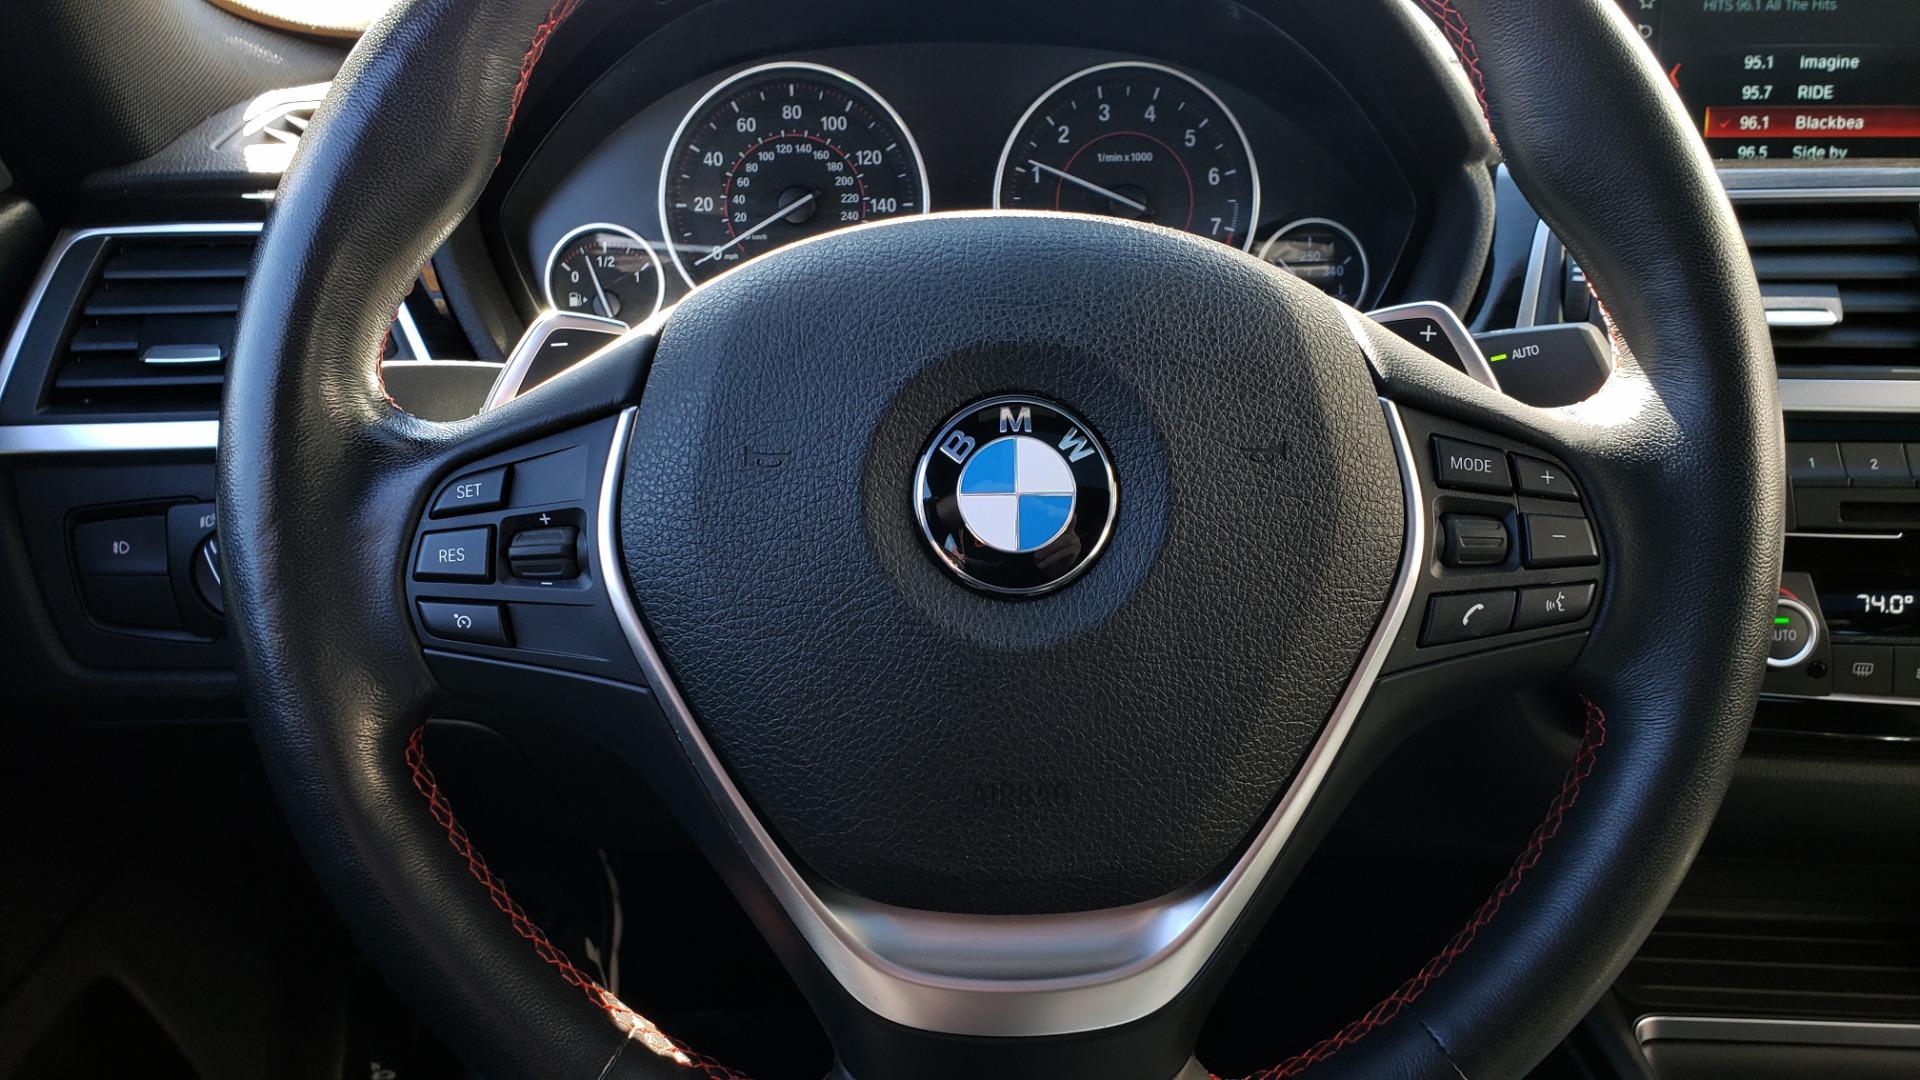 Used 2018 BMW 4 SERIES 430IXDRIVE / PREMIUM / NAV / SUNROOF / ESSENTIALS PKG for sale $29,495 at Formula Imports in Charlotte NC 28227 36